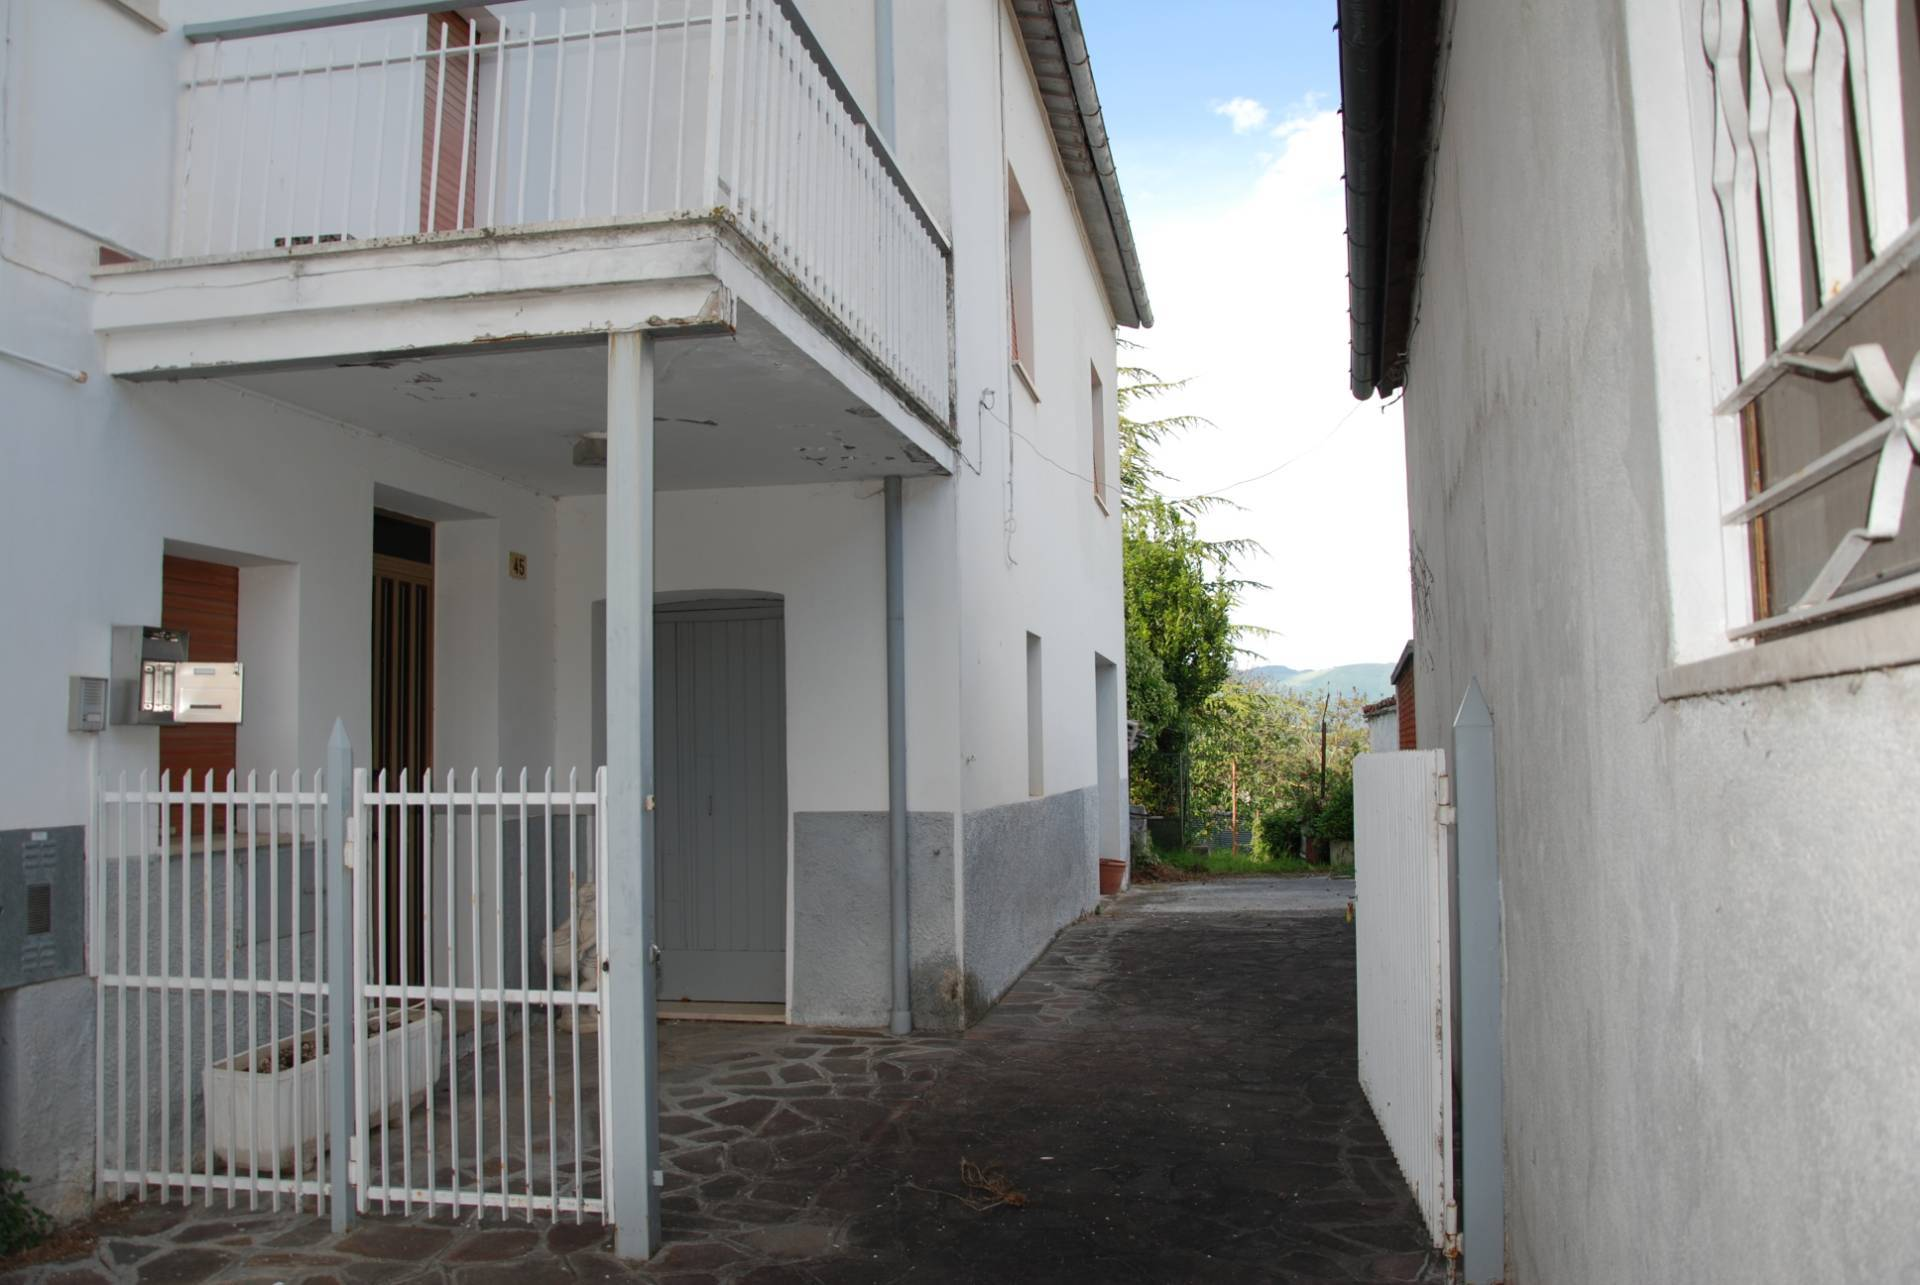 Villetta a schiera in vendita a Fabriano (AN)